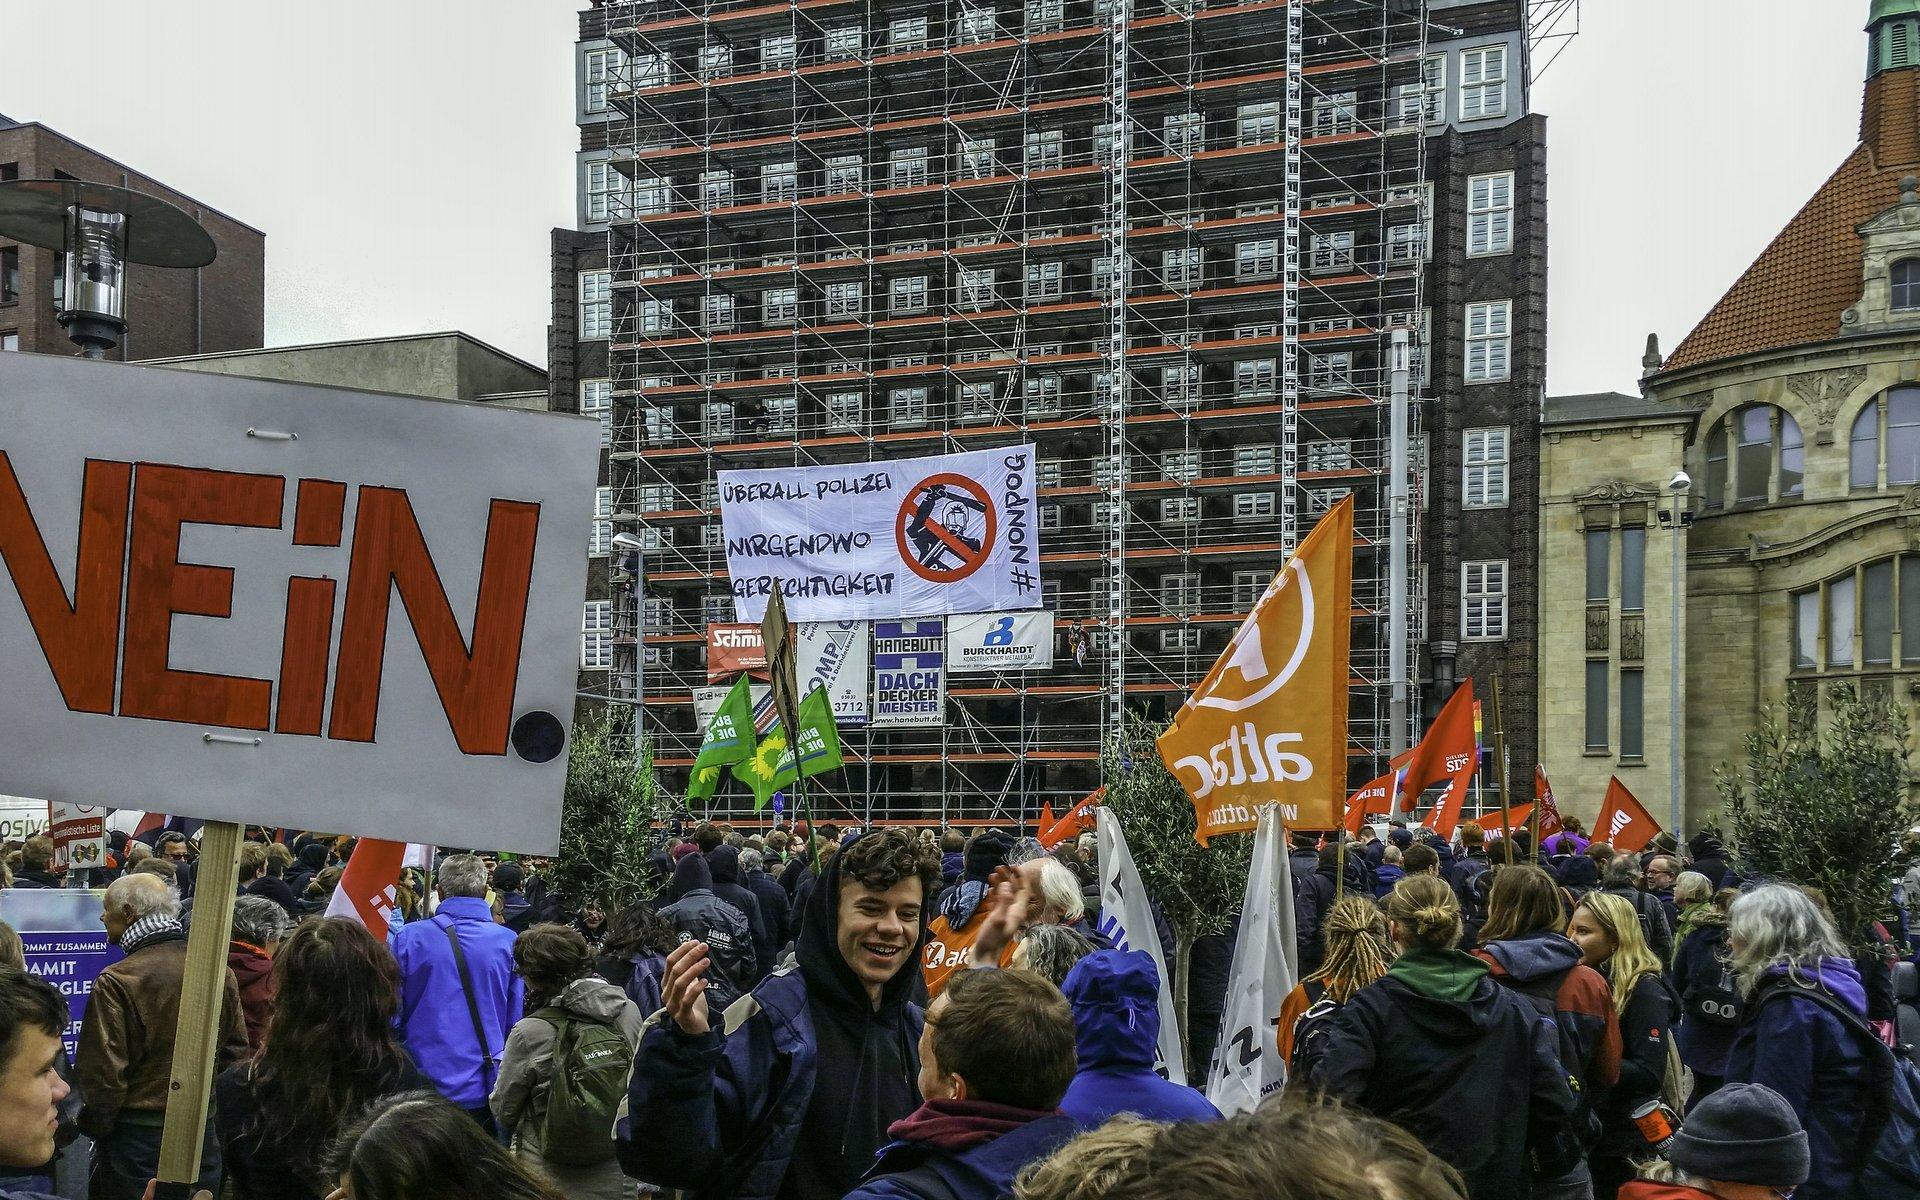 Kletterer bringen ein Banner ans Anzeigerhochhaus am Demostart an der Goseriede an